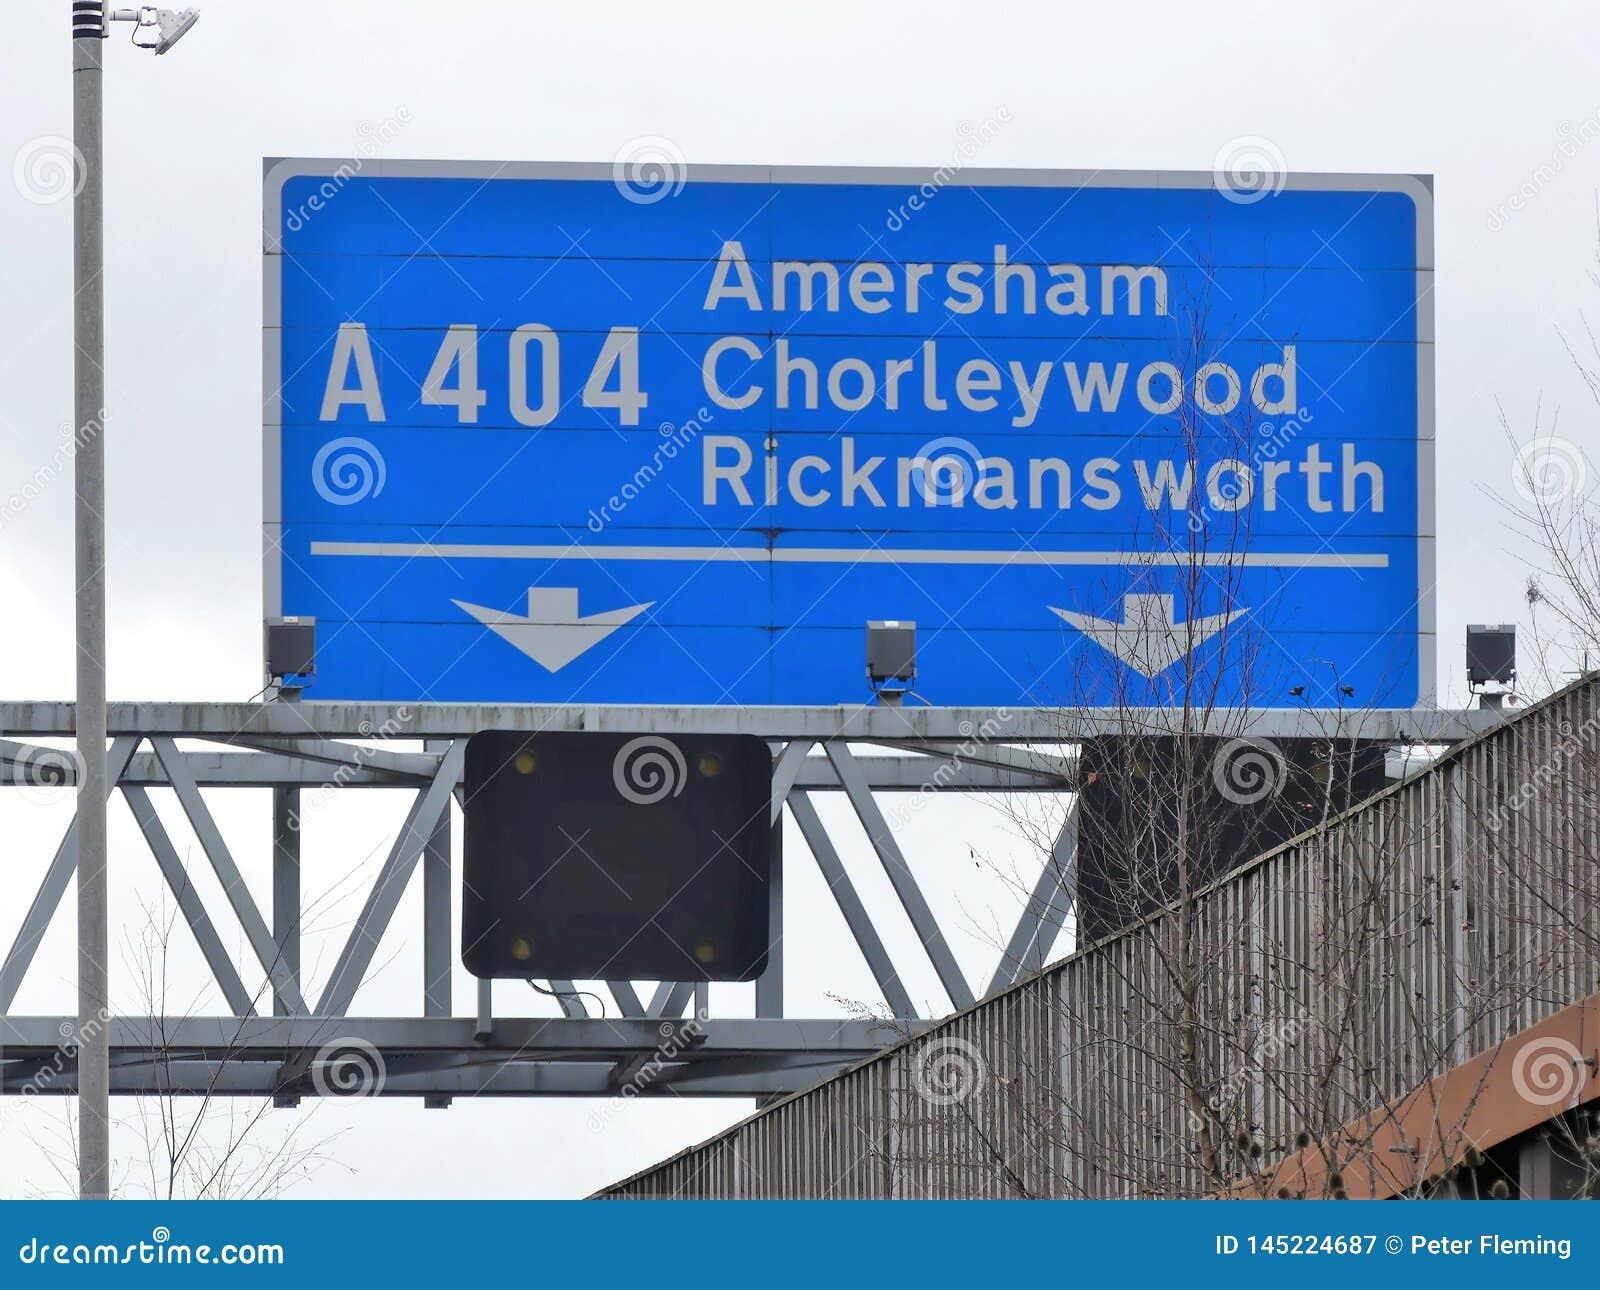 M25 σημάδι εξόδων αυτοκινητόδρομων στη σύνδεση 18 για Amersham, Chorleywood και Rickm